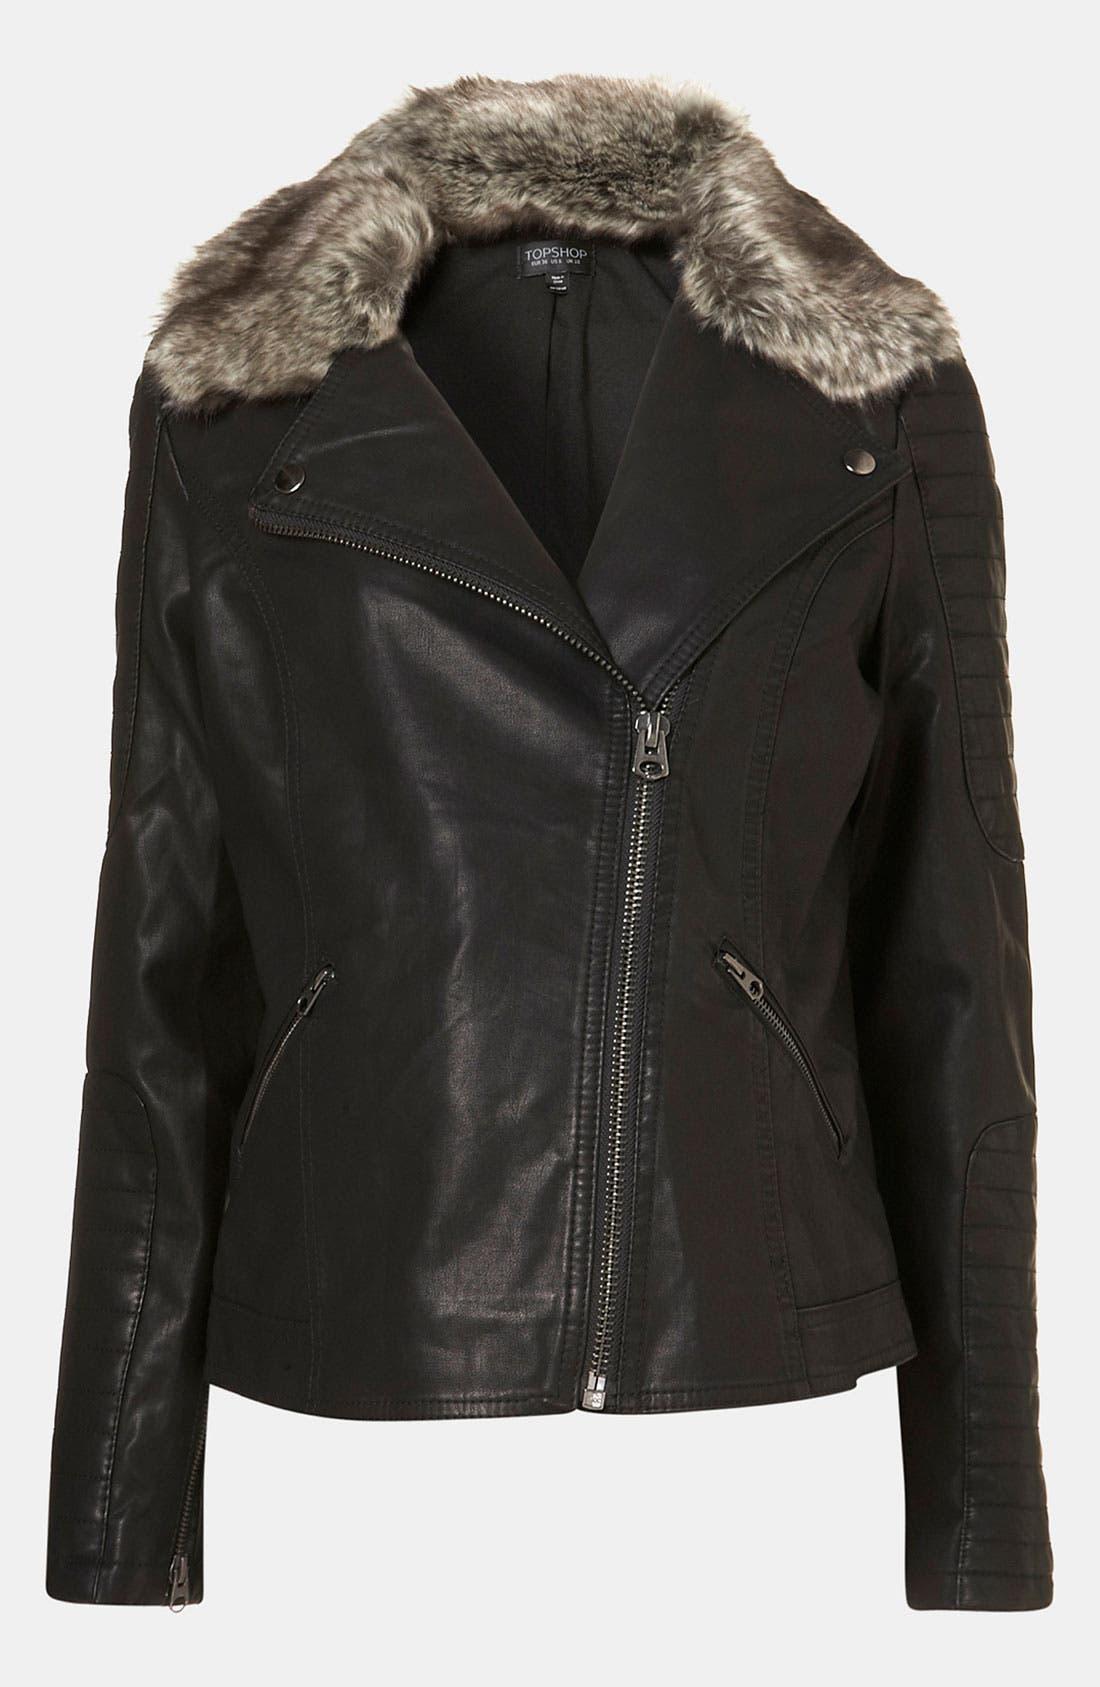 Main Image - Topshop 'Maddox' Faux Leather Maternity Jacket